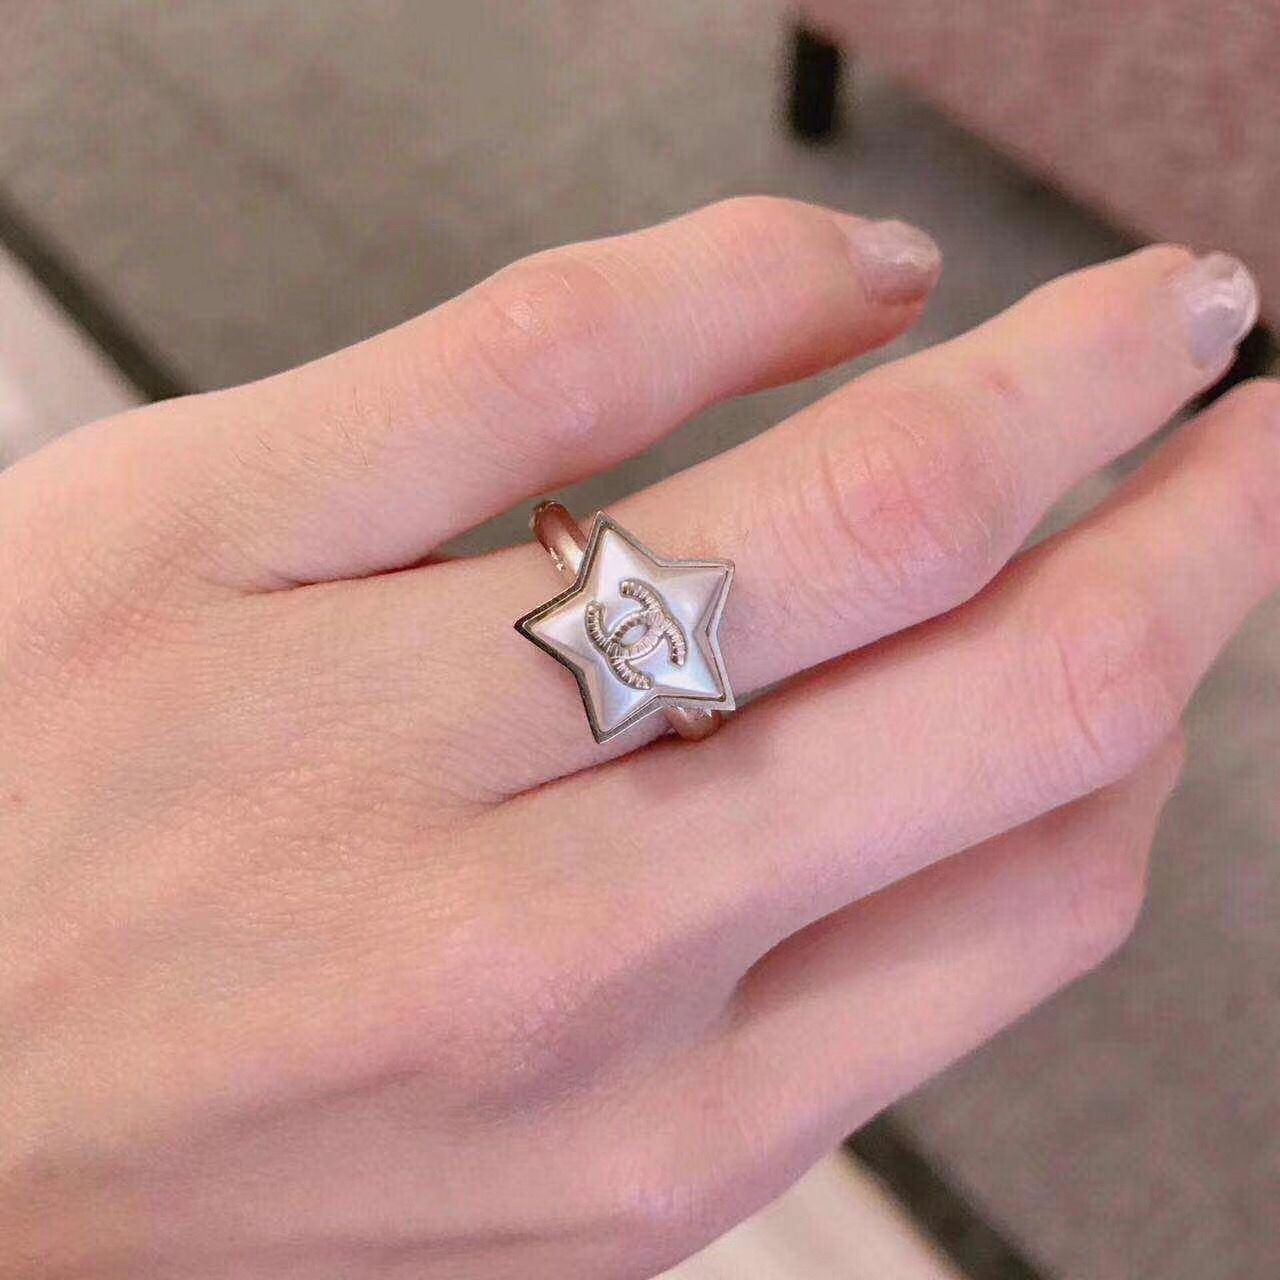 Chanel woman jewelry rings   Jewelry   Pinterest